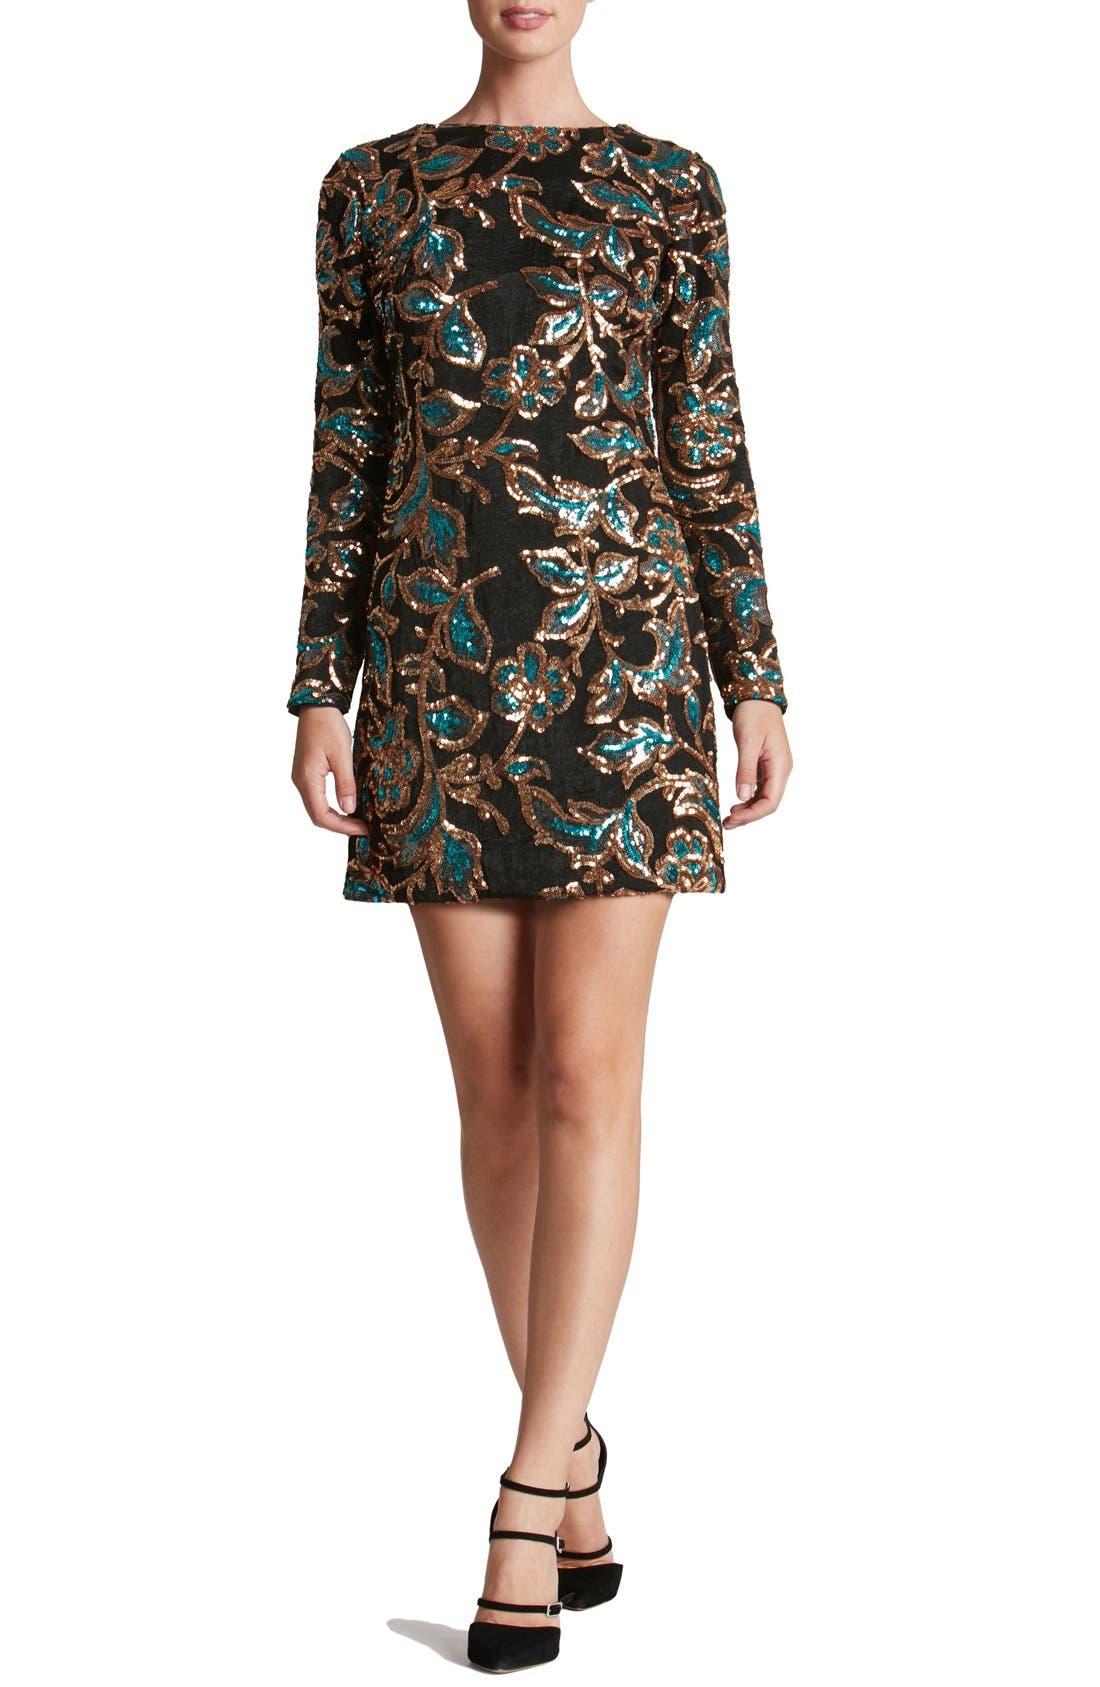 Alternate Image 1 Selected - Dress the Population 'Naomi' Sequin Minidress